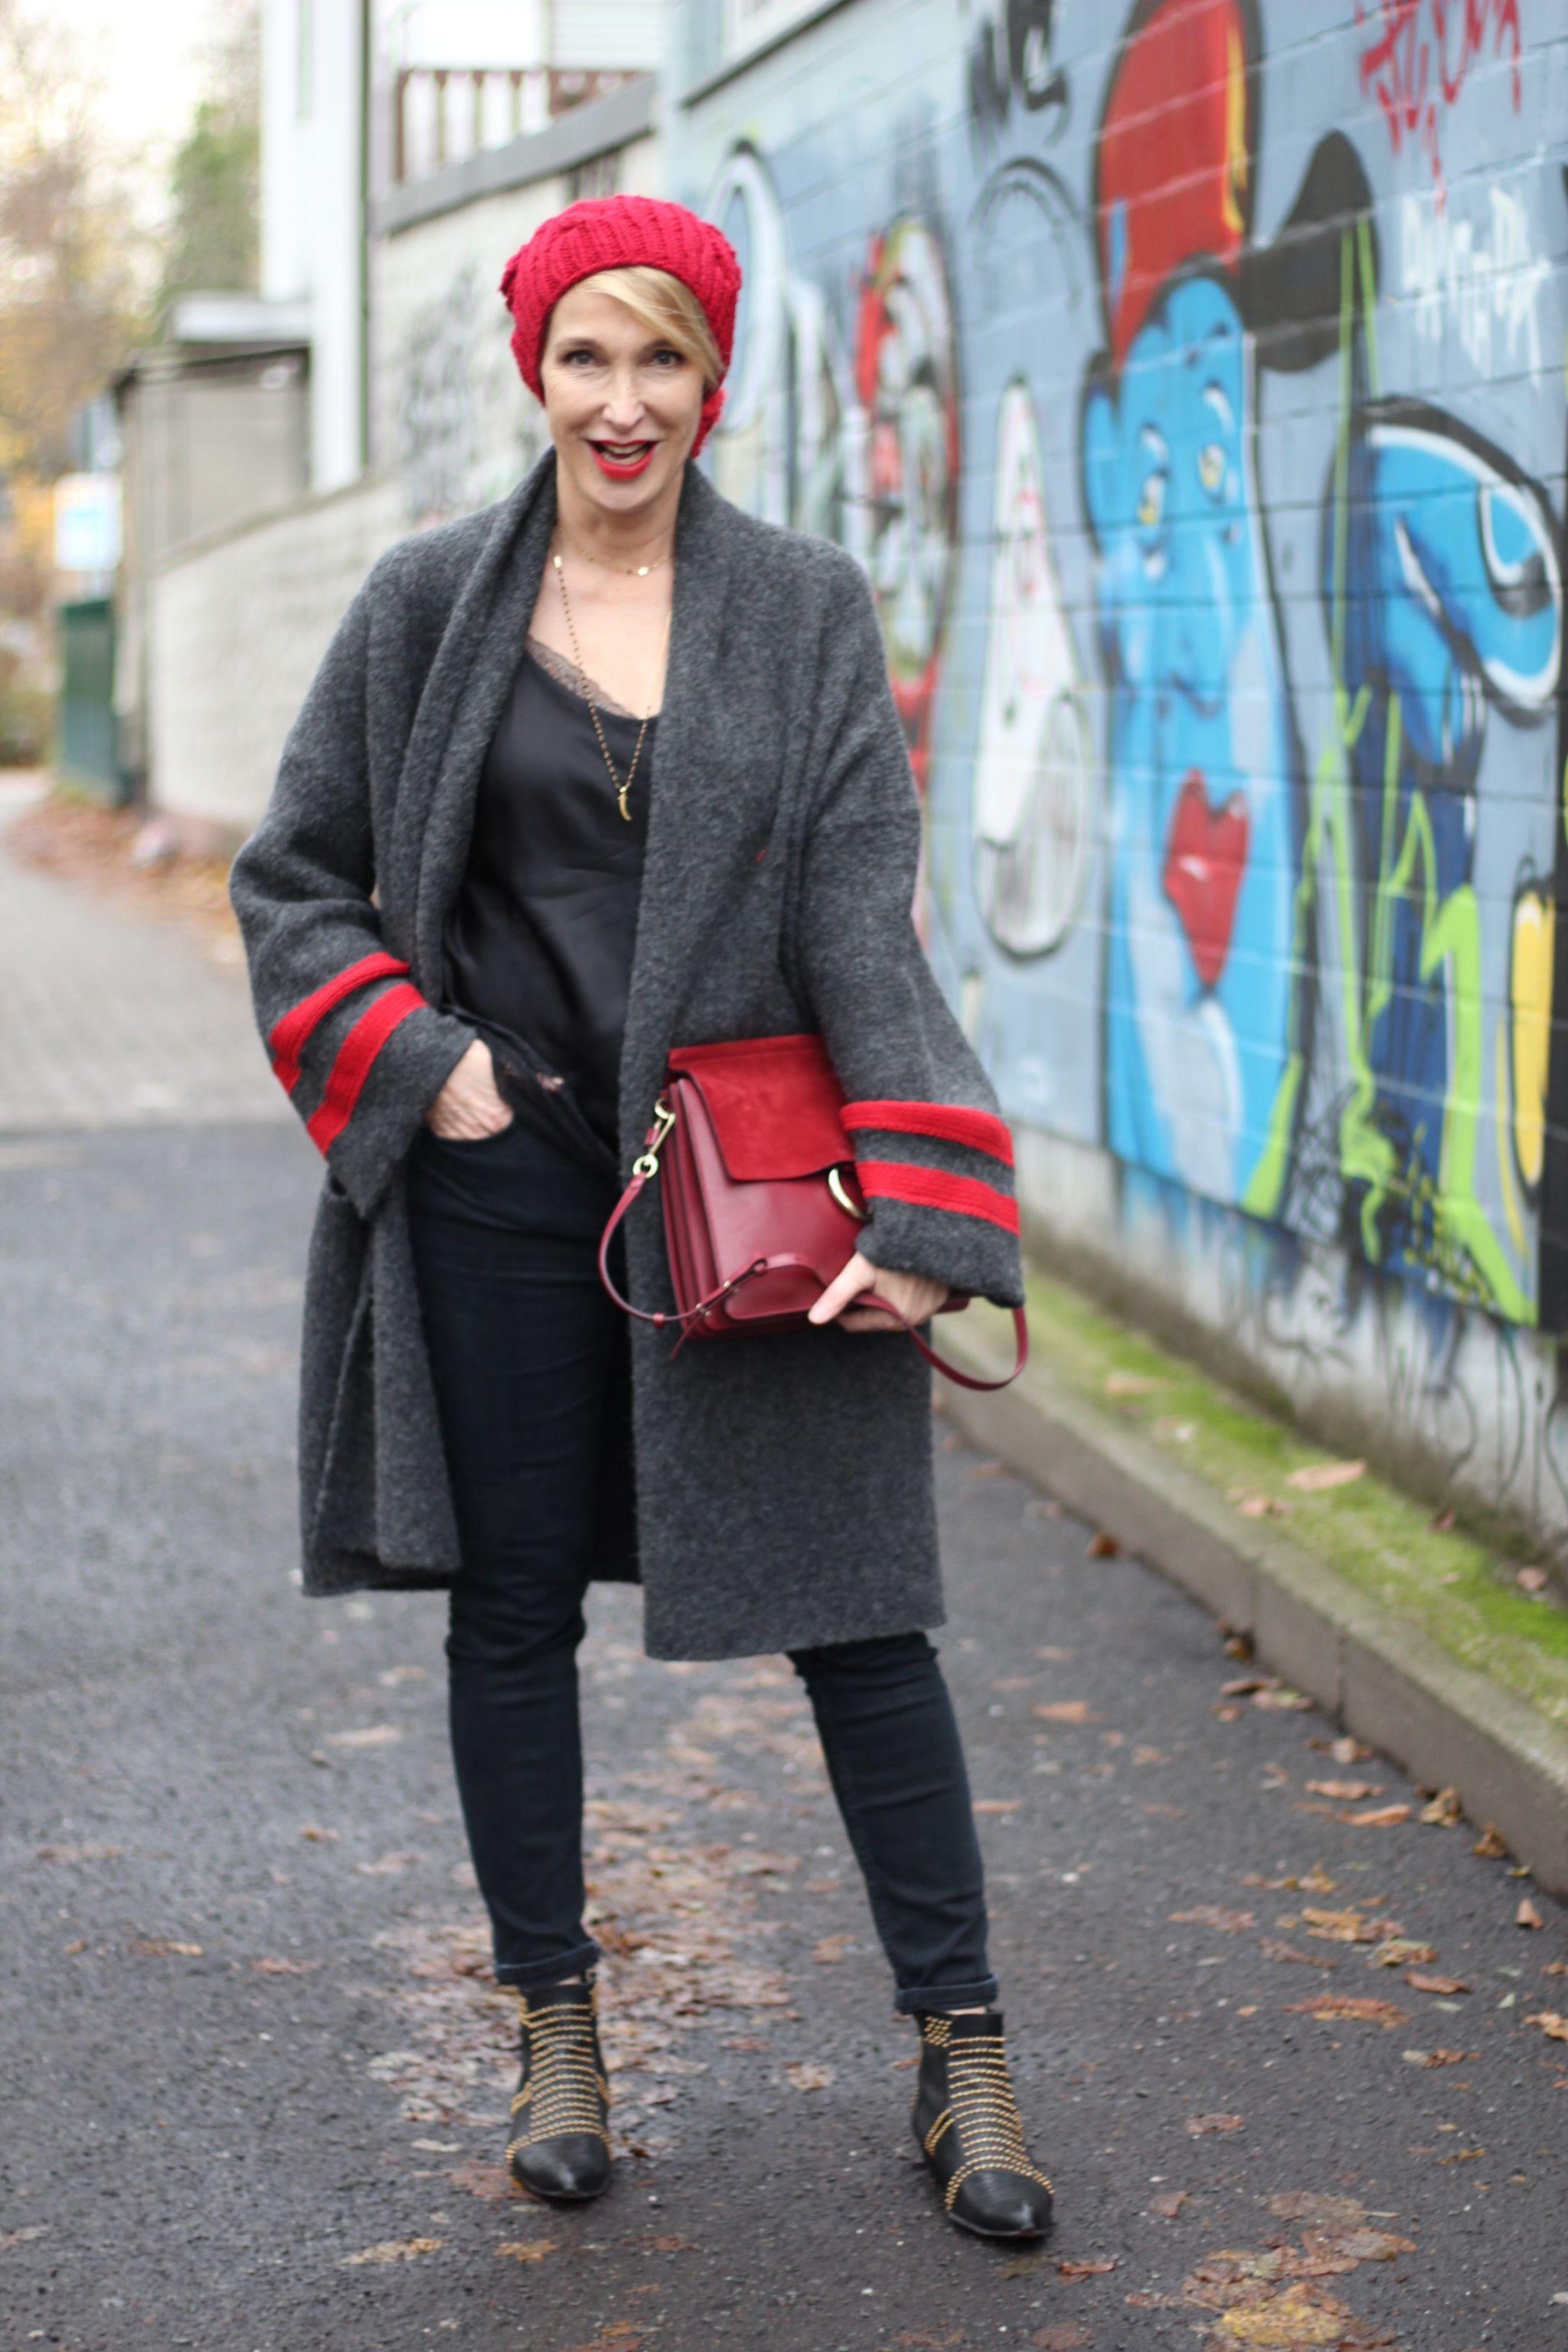 glamupyourlifestyle langer-cardigan anine-bing-boots chloe-faye-tasche lingerie-trend ü40-blog ue40-mode